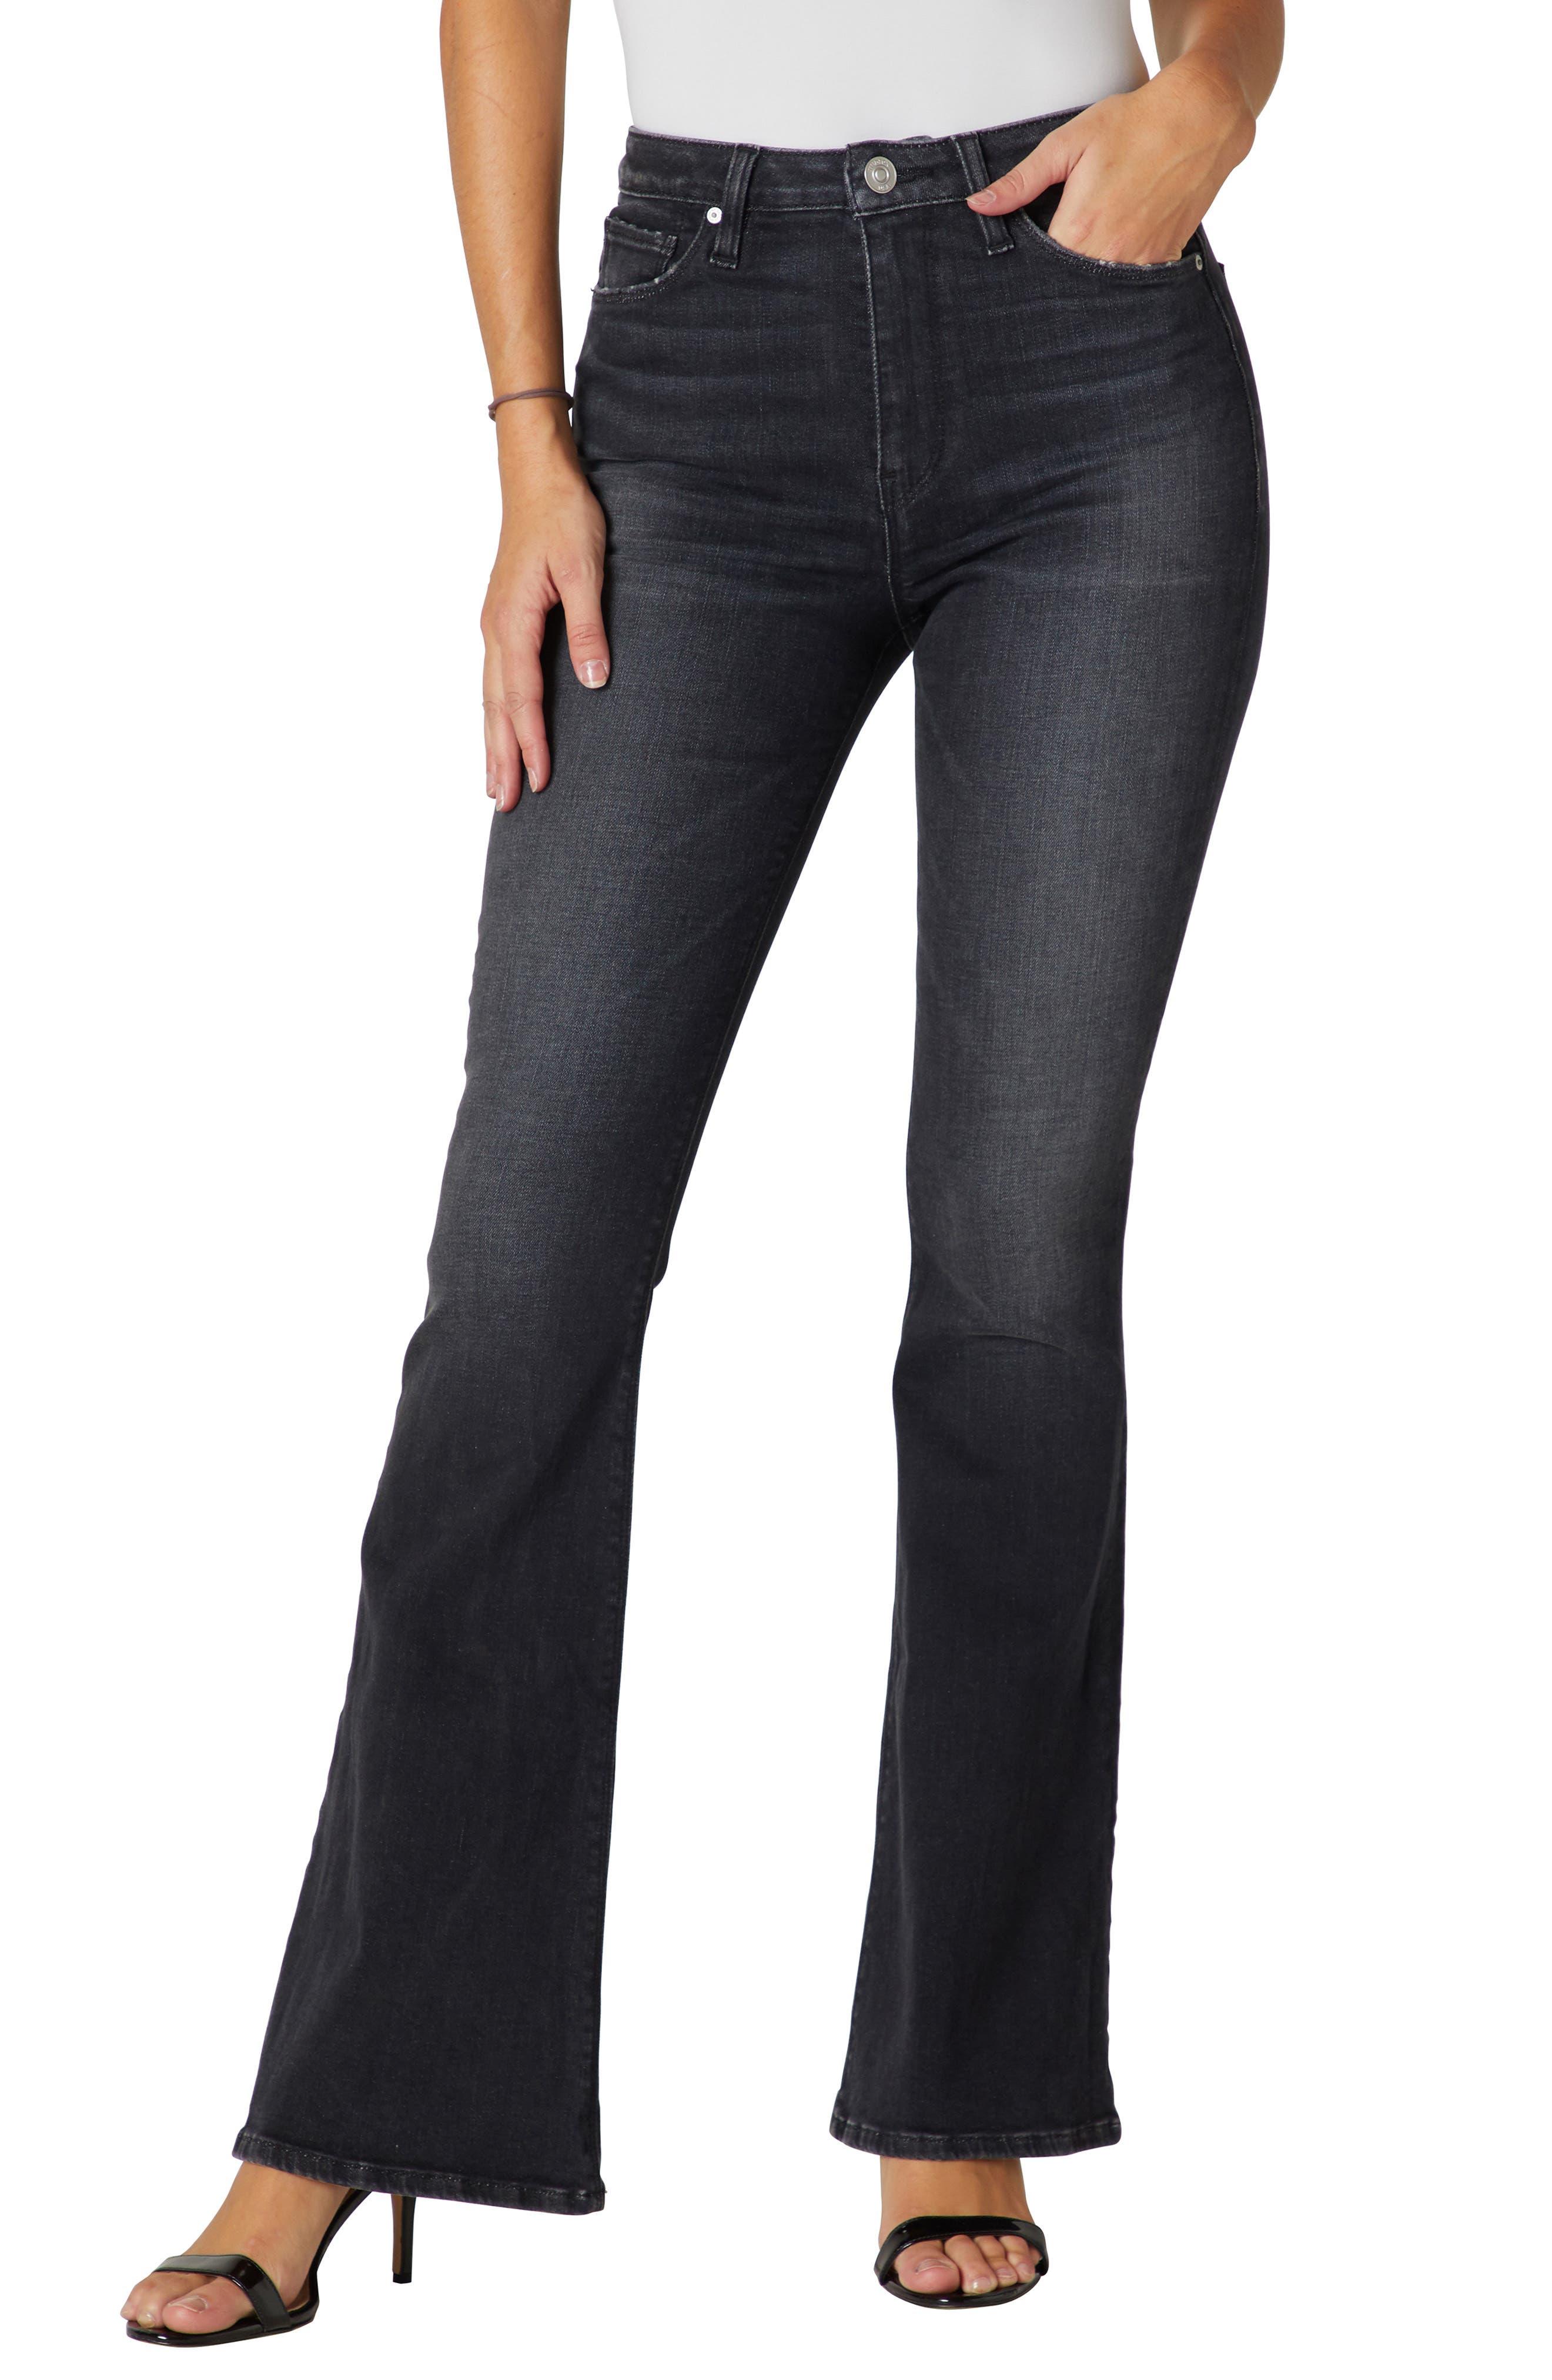 Women's Hudson Jeans Holly High Waist Flare Jeans